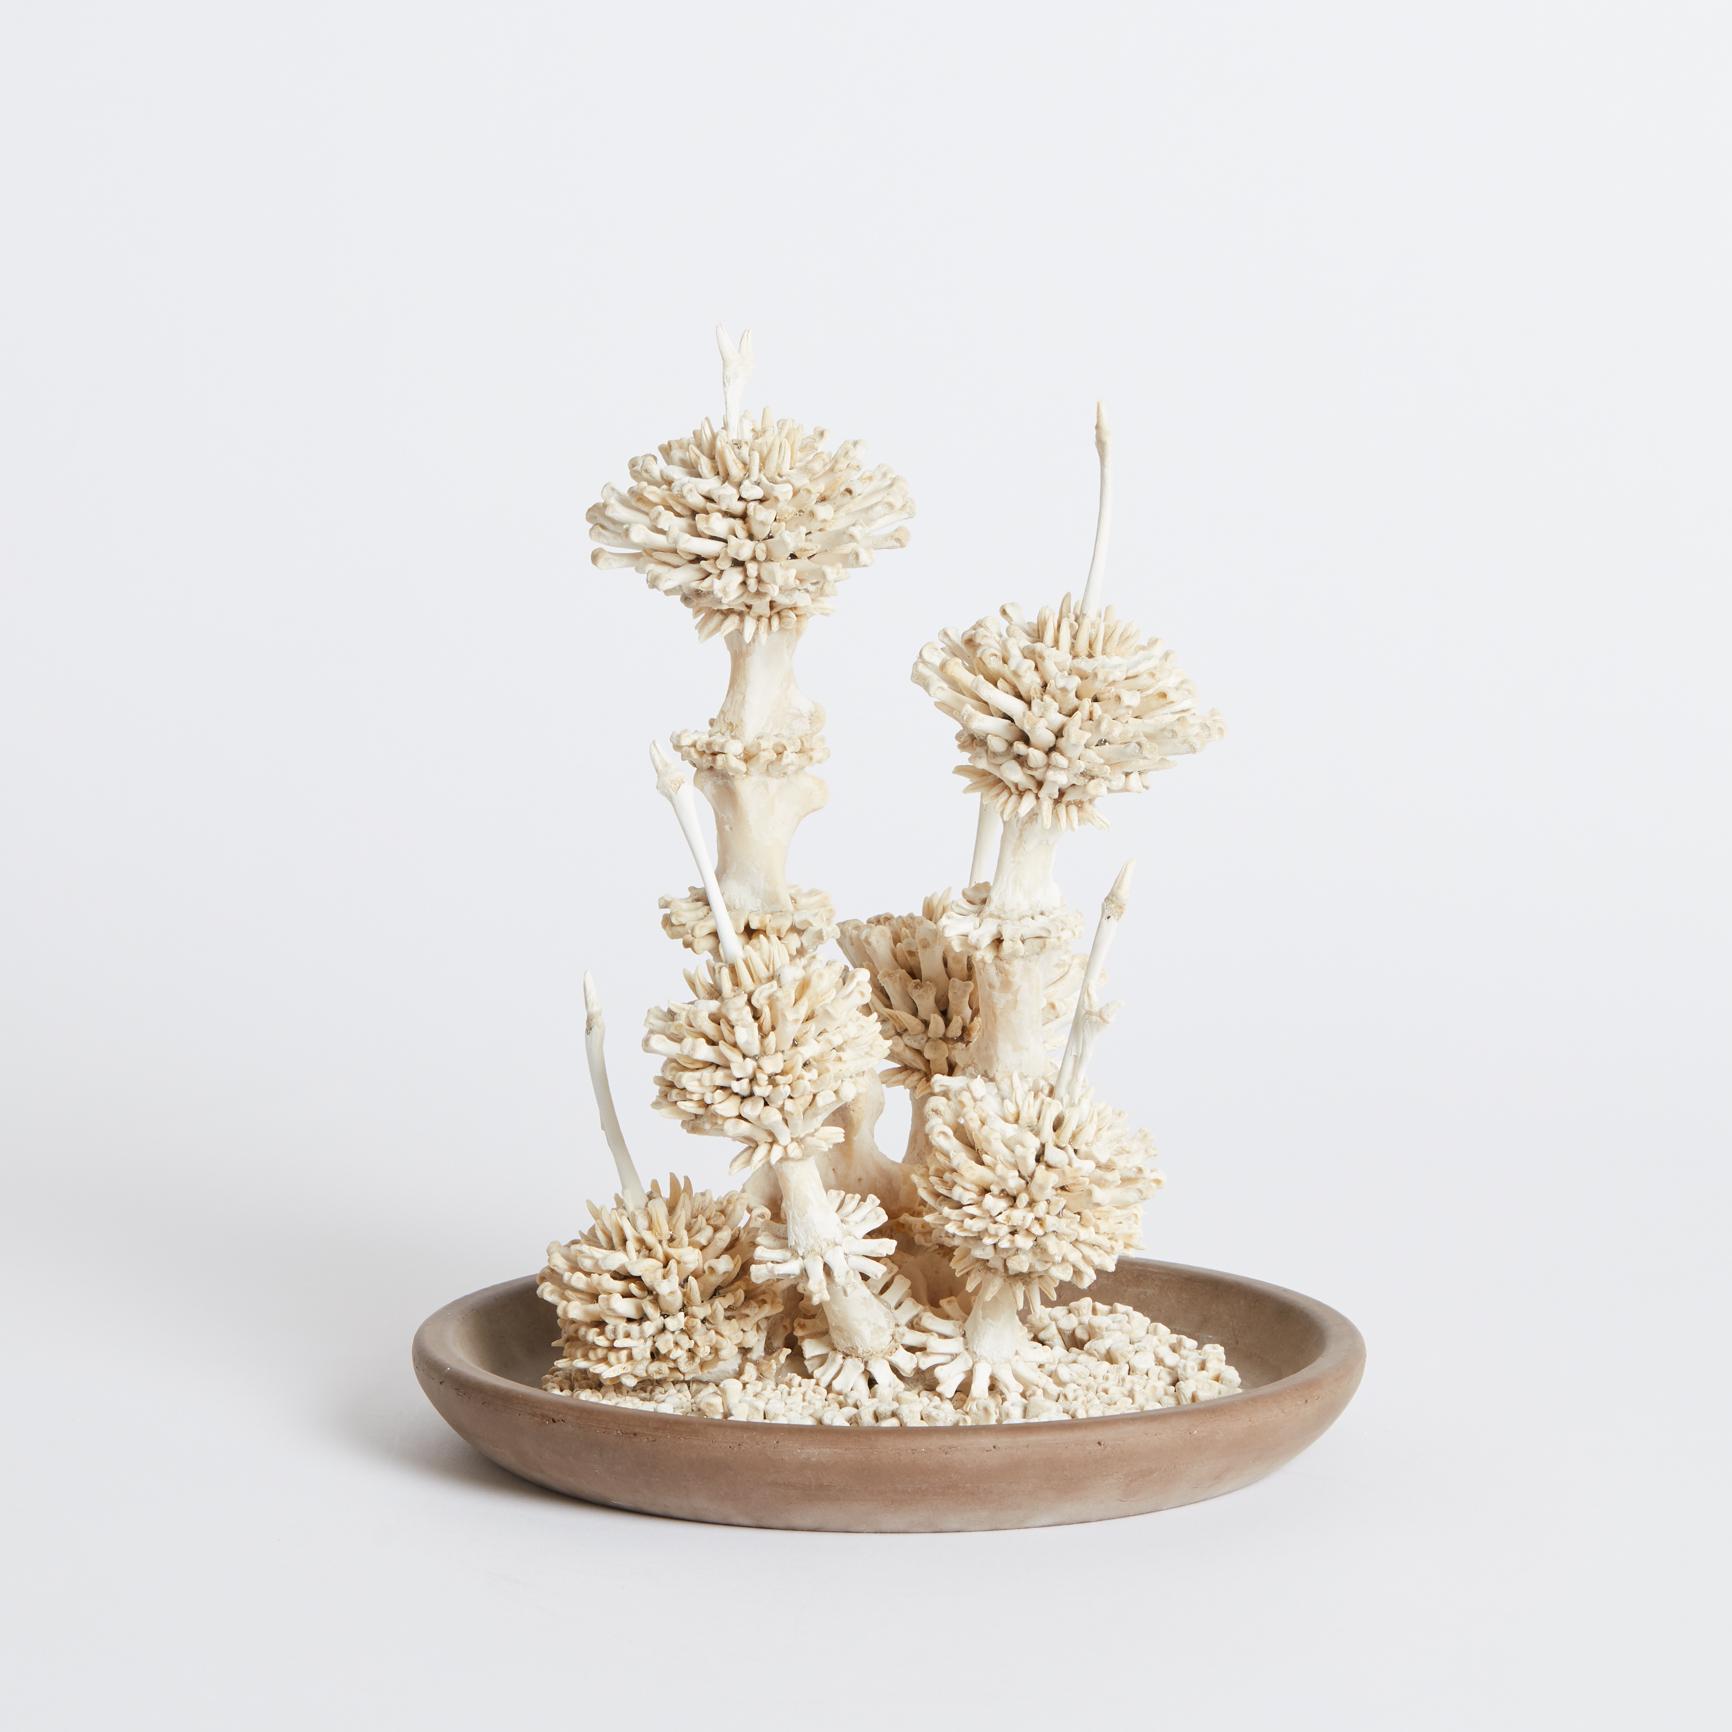 Flora 2017, Bone, Earthenware, C. Charlotte Oldman